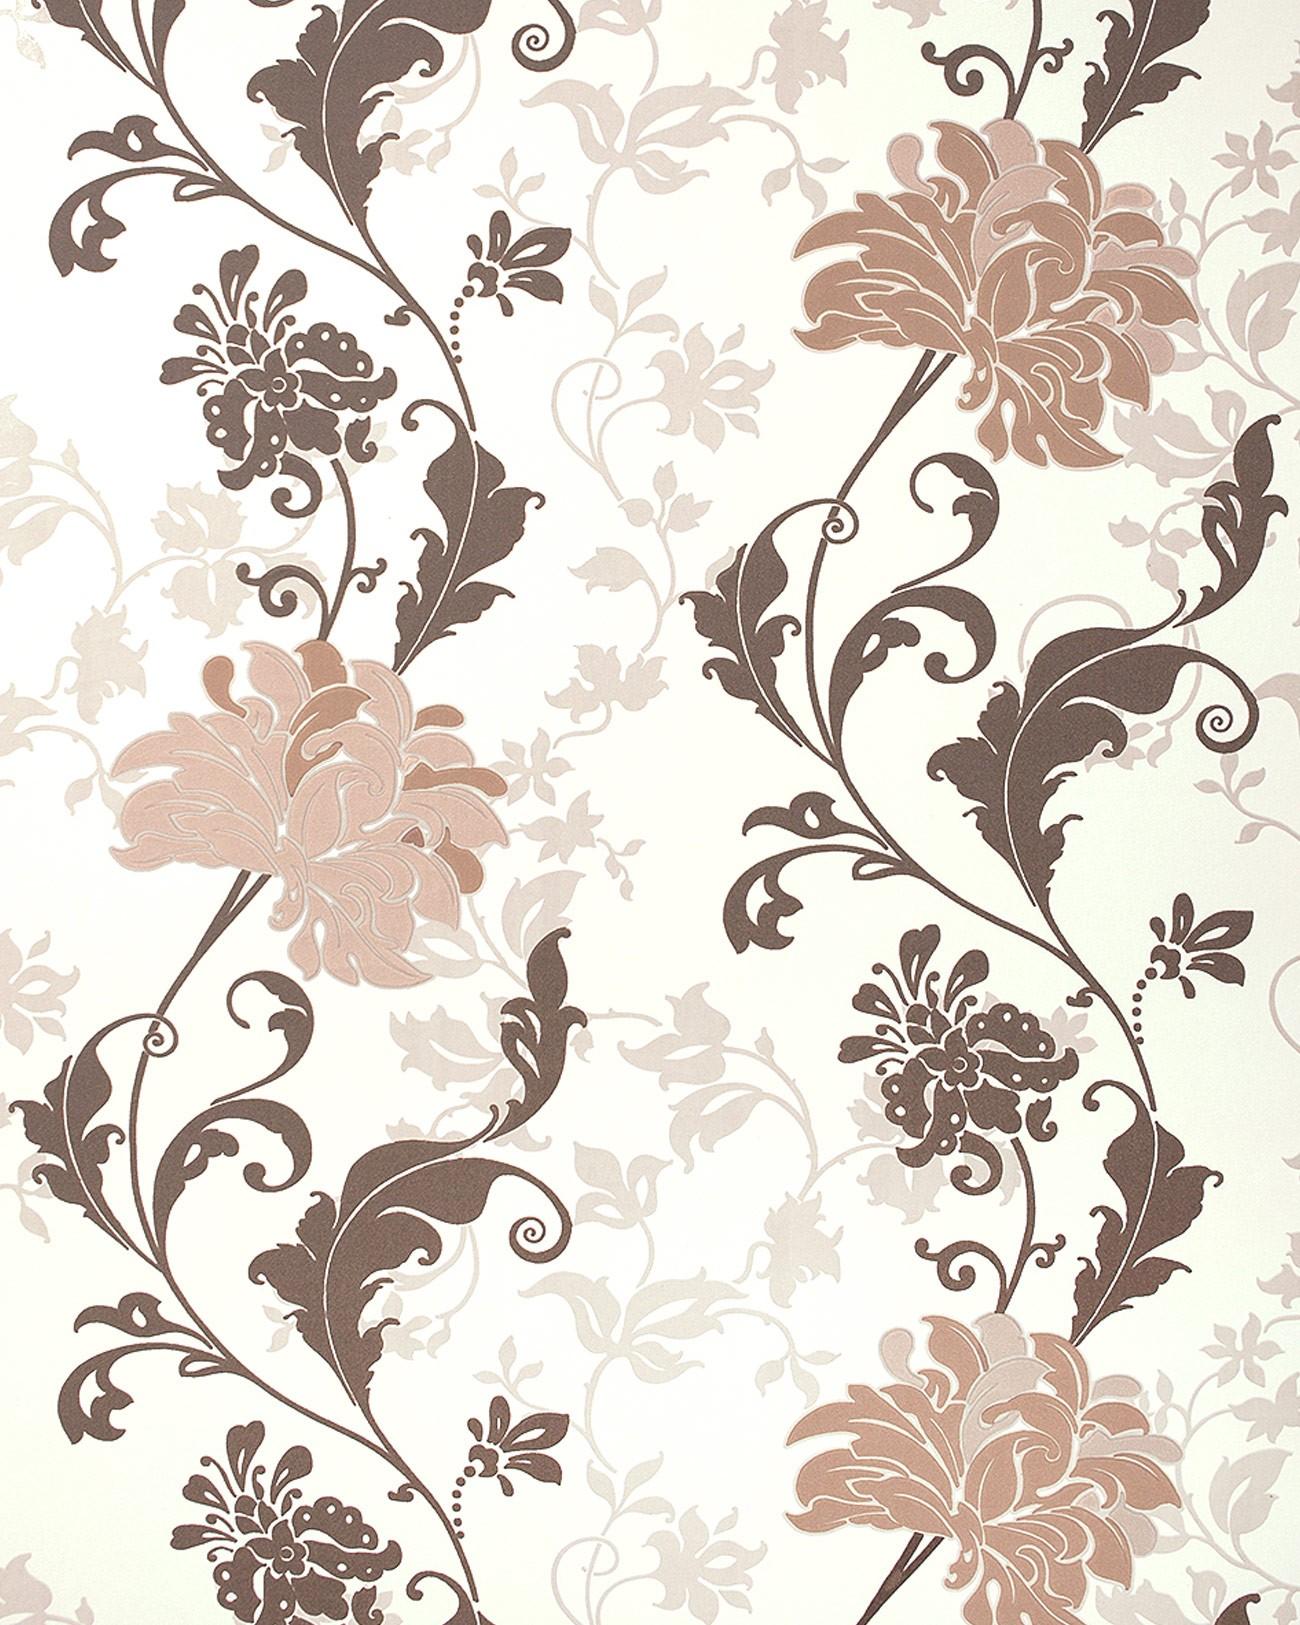 edem 833 23 edles florales muster blumen tapete braun beige hellbraun 70 cm ebay. Black Bedroom Furniture Sets. Home Design Ideas